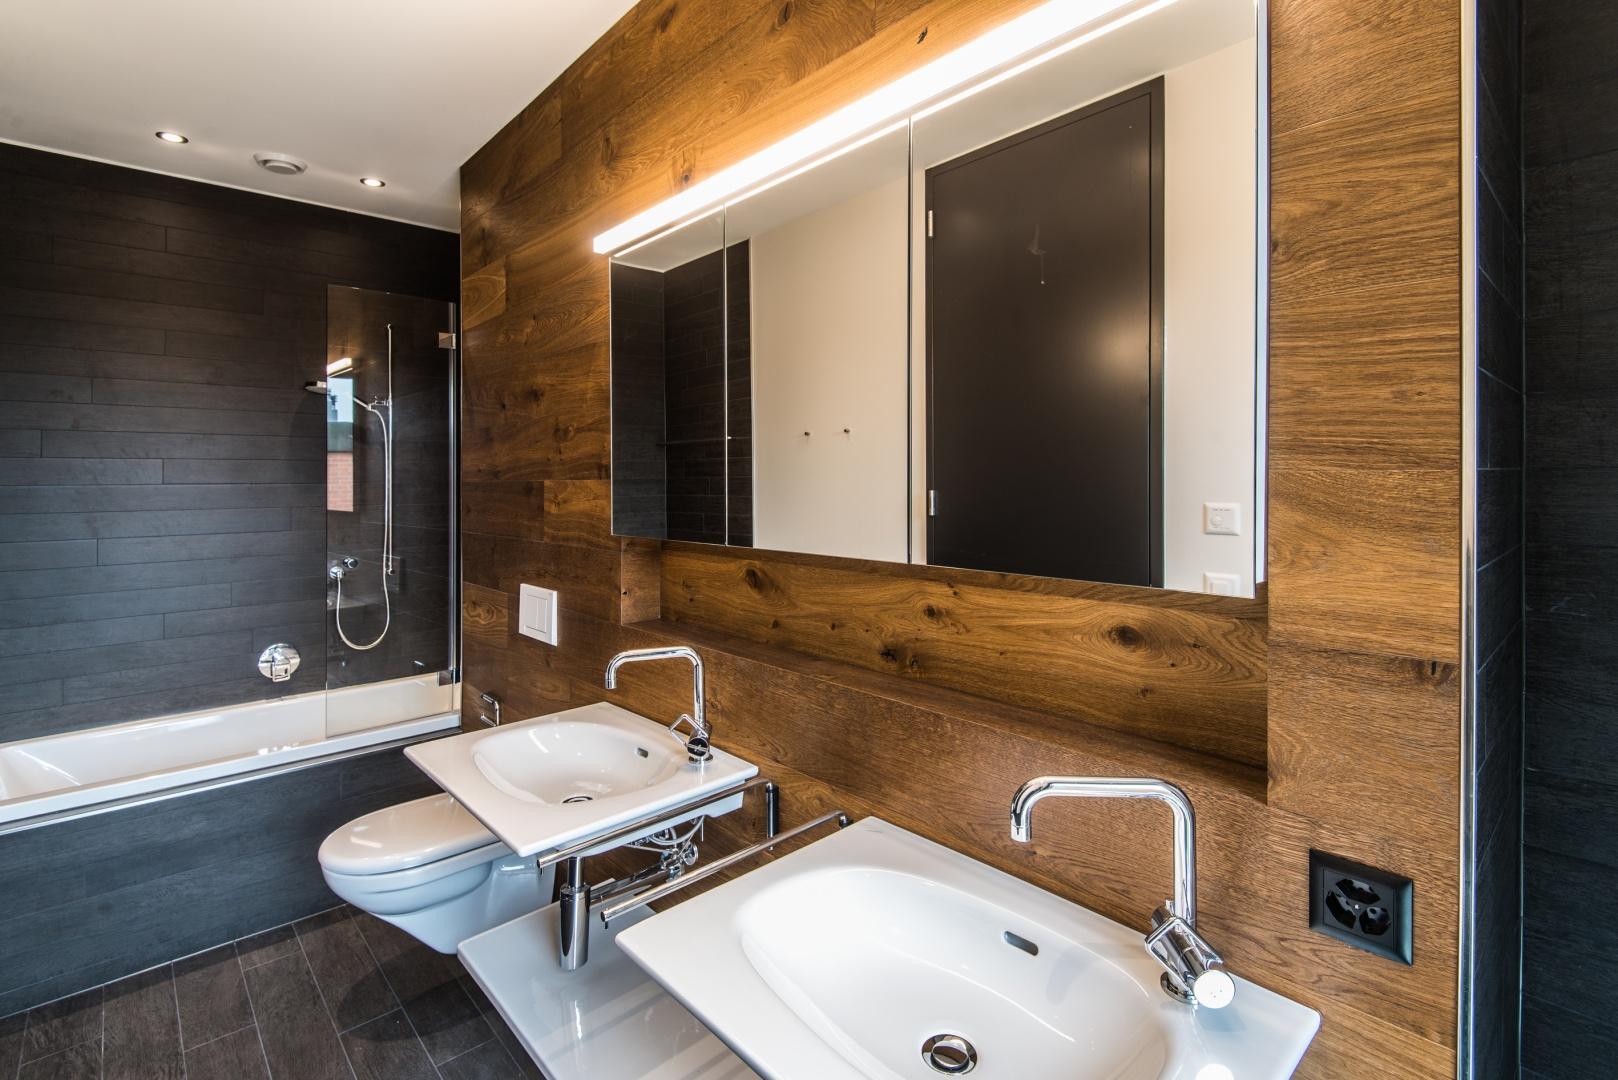 Salle de bains © Ferrara Architekten AG